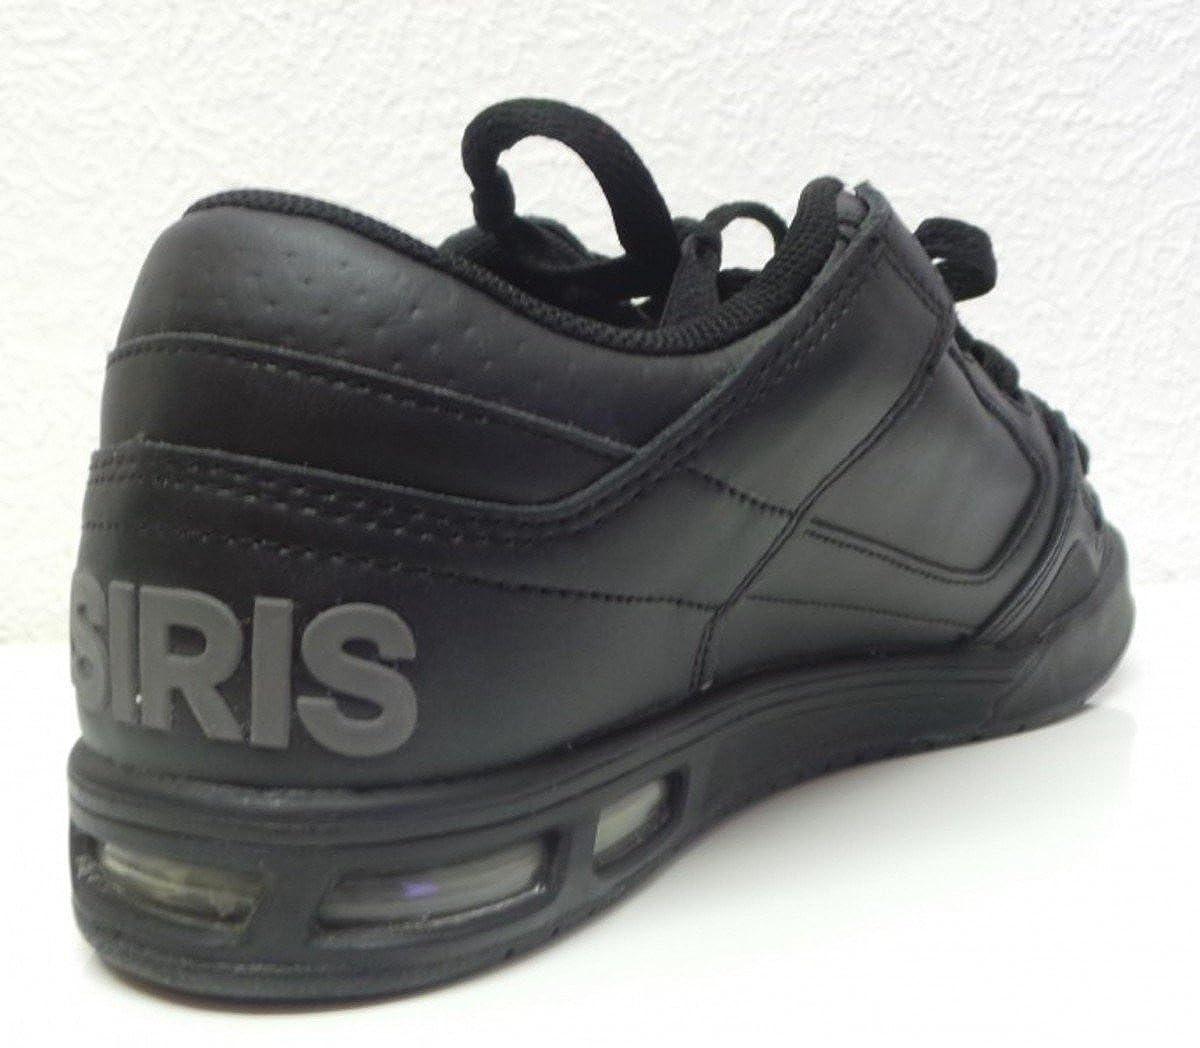 Osiris Skateboard Schuhe Assist schwarz/schwarz - - schwarz/schwarz fda2af